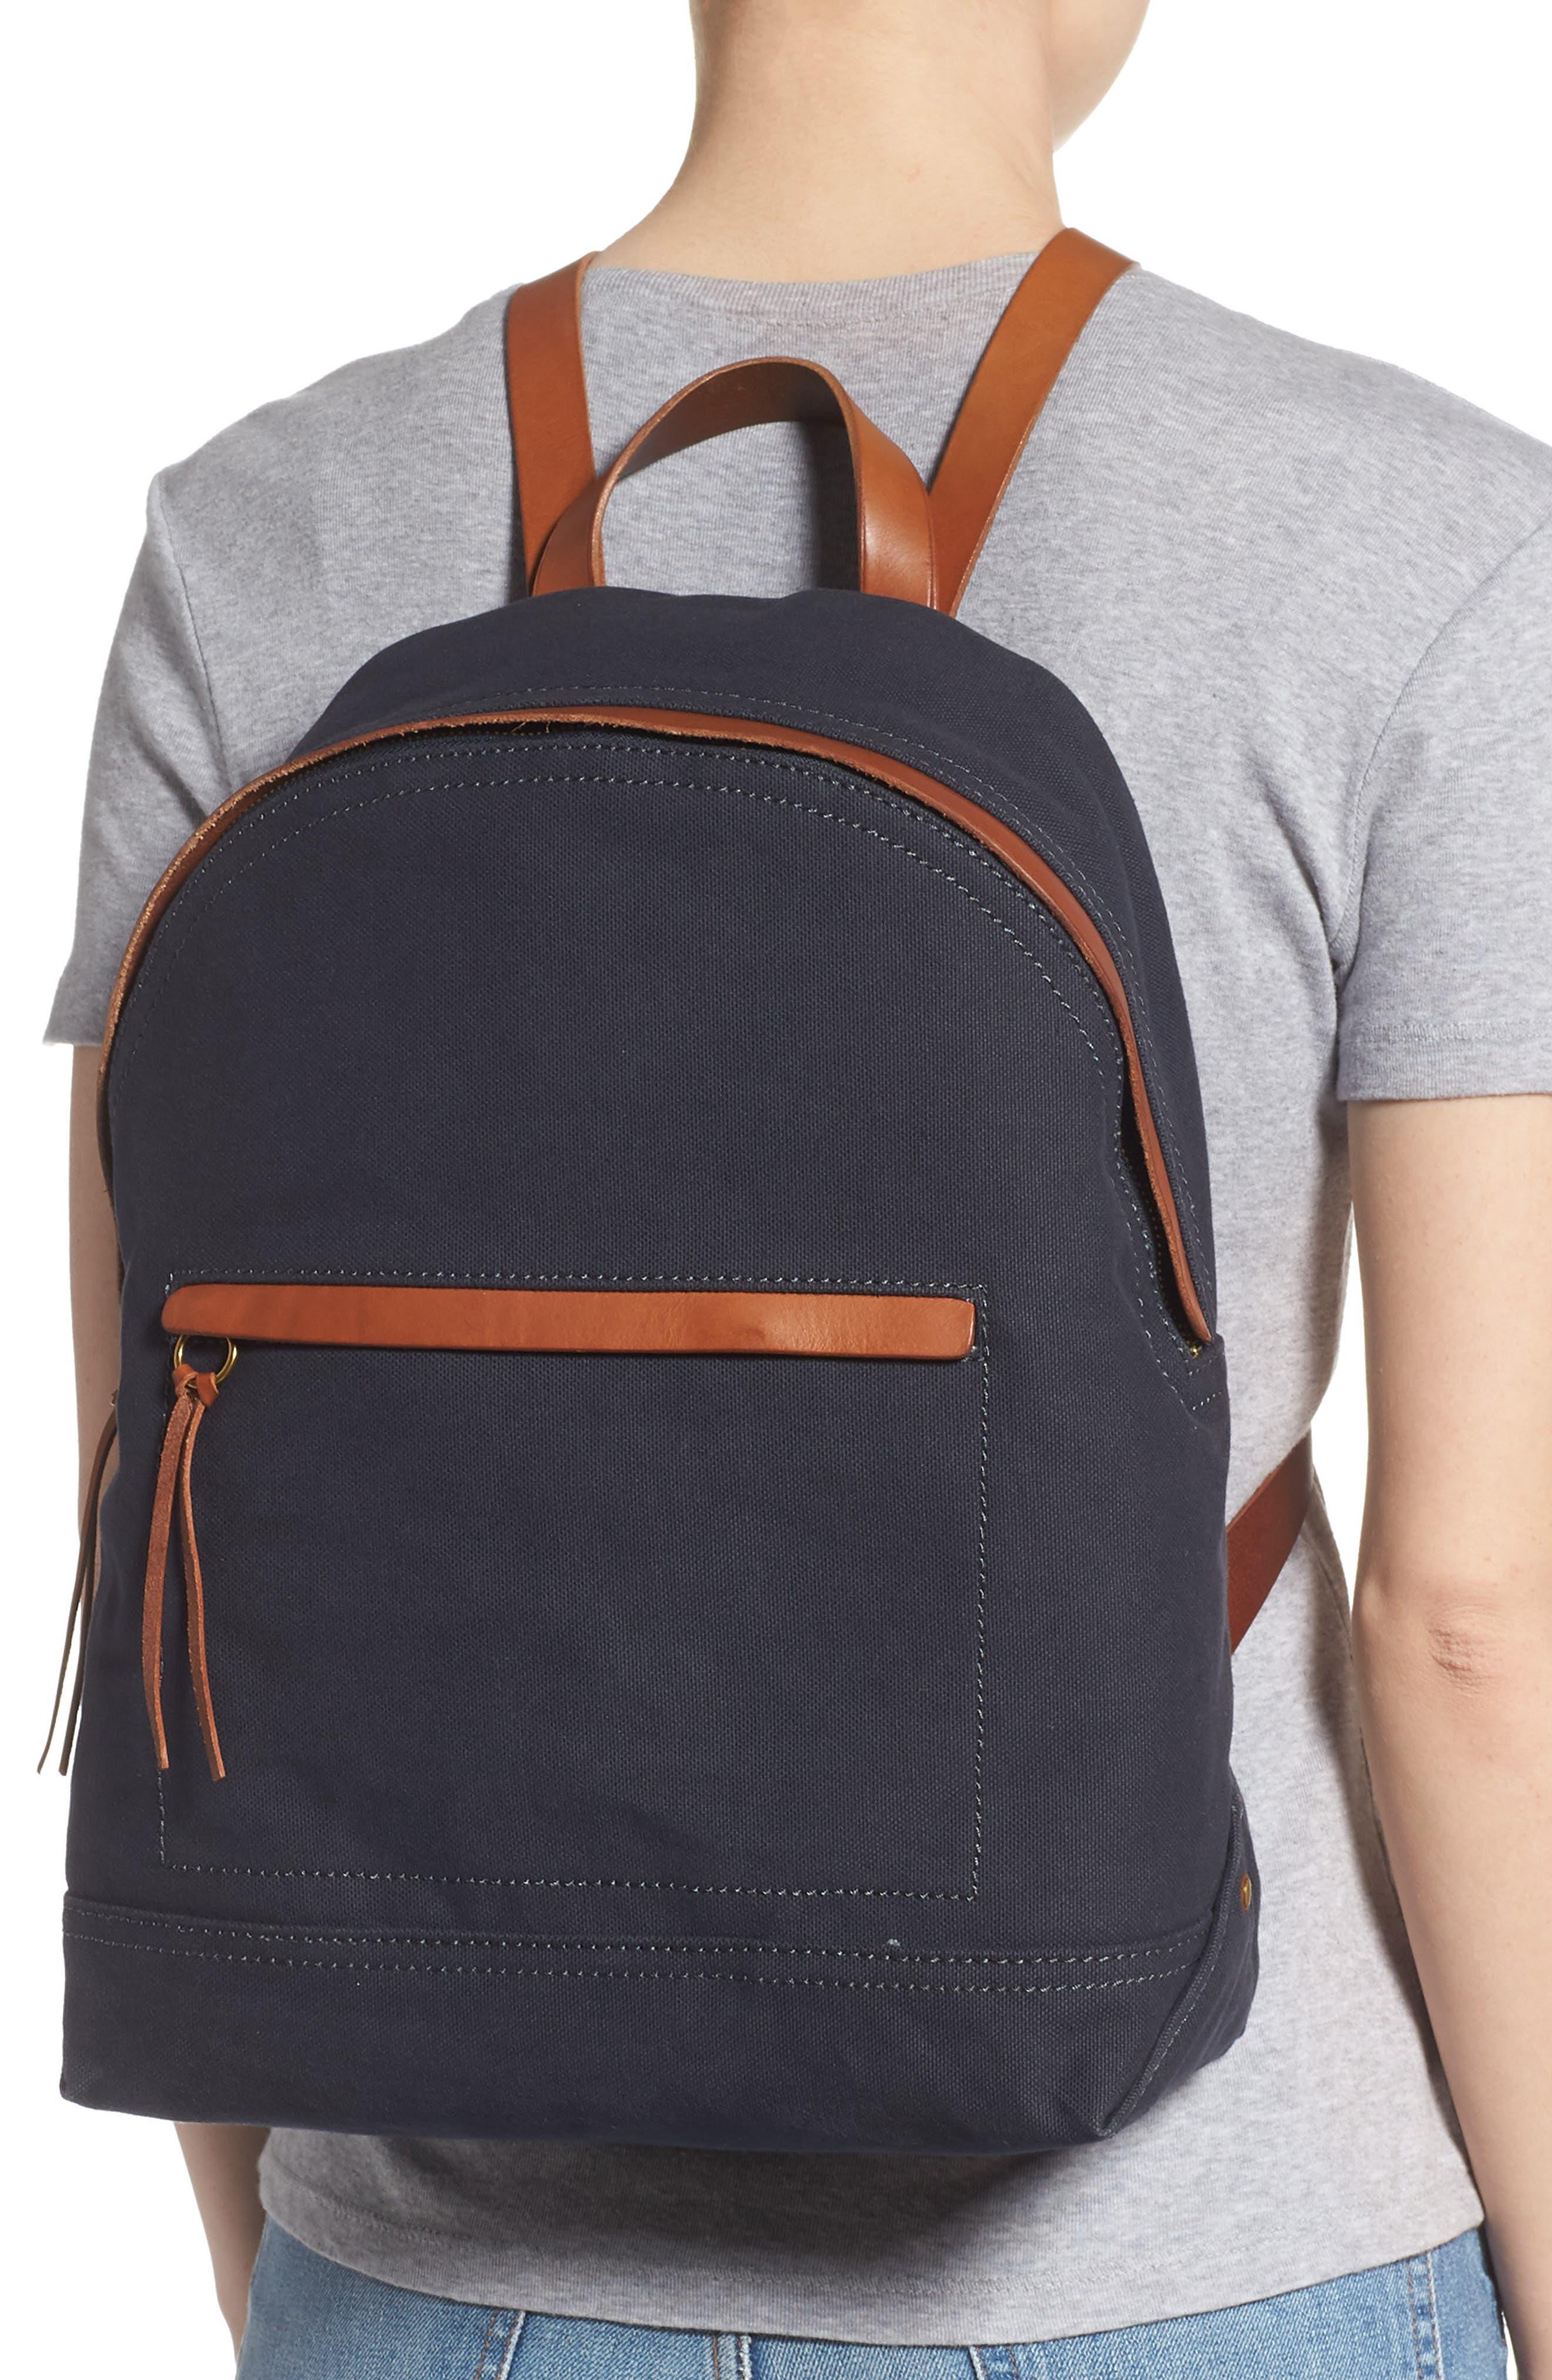 MADEWELL, The Charleston Backpack, Alternate thumbnail 2, color, BLACK SEA